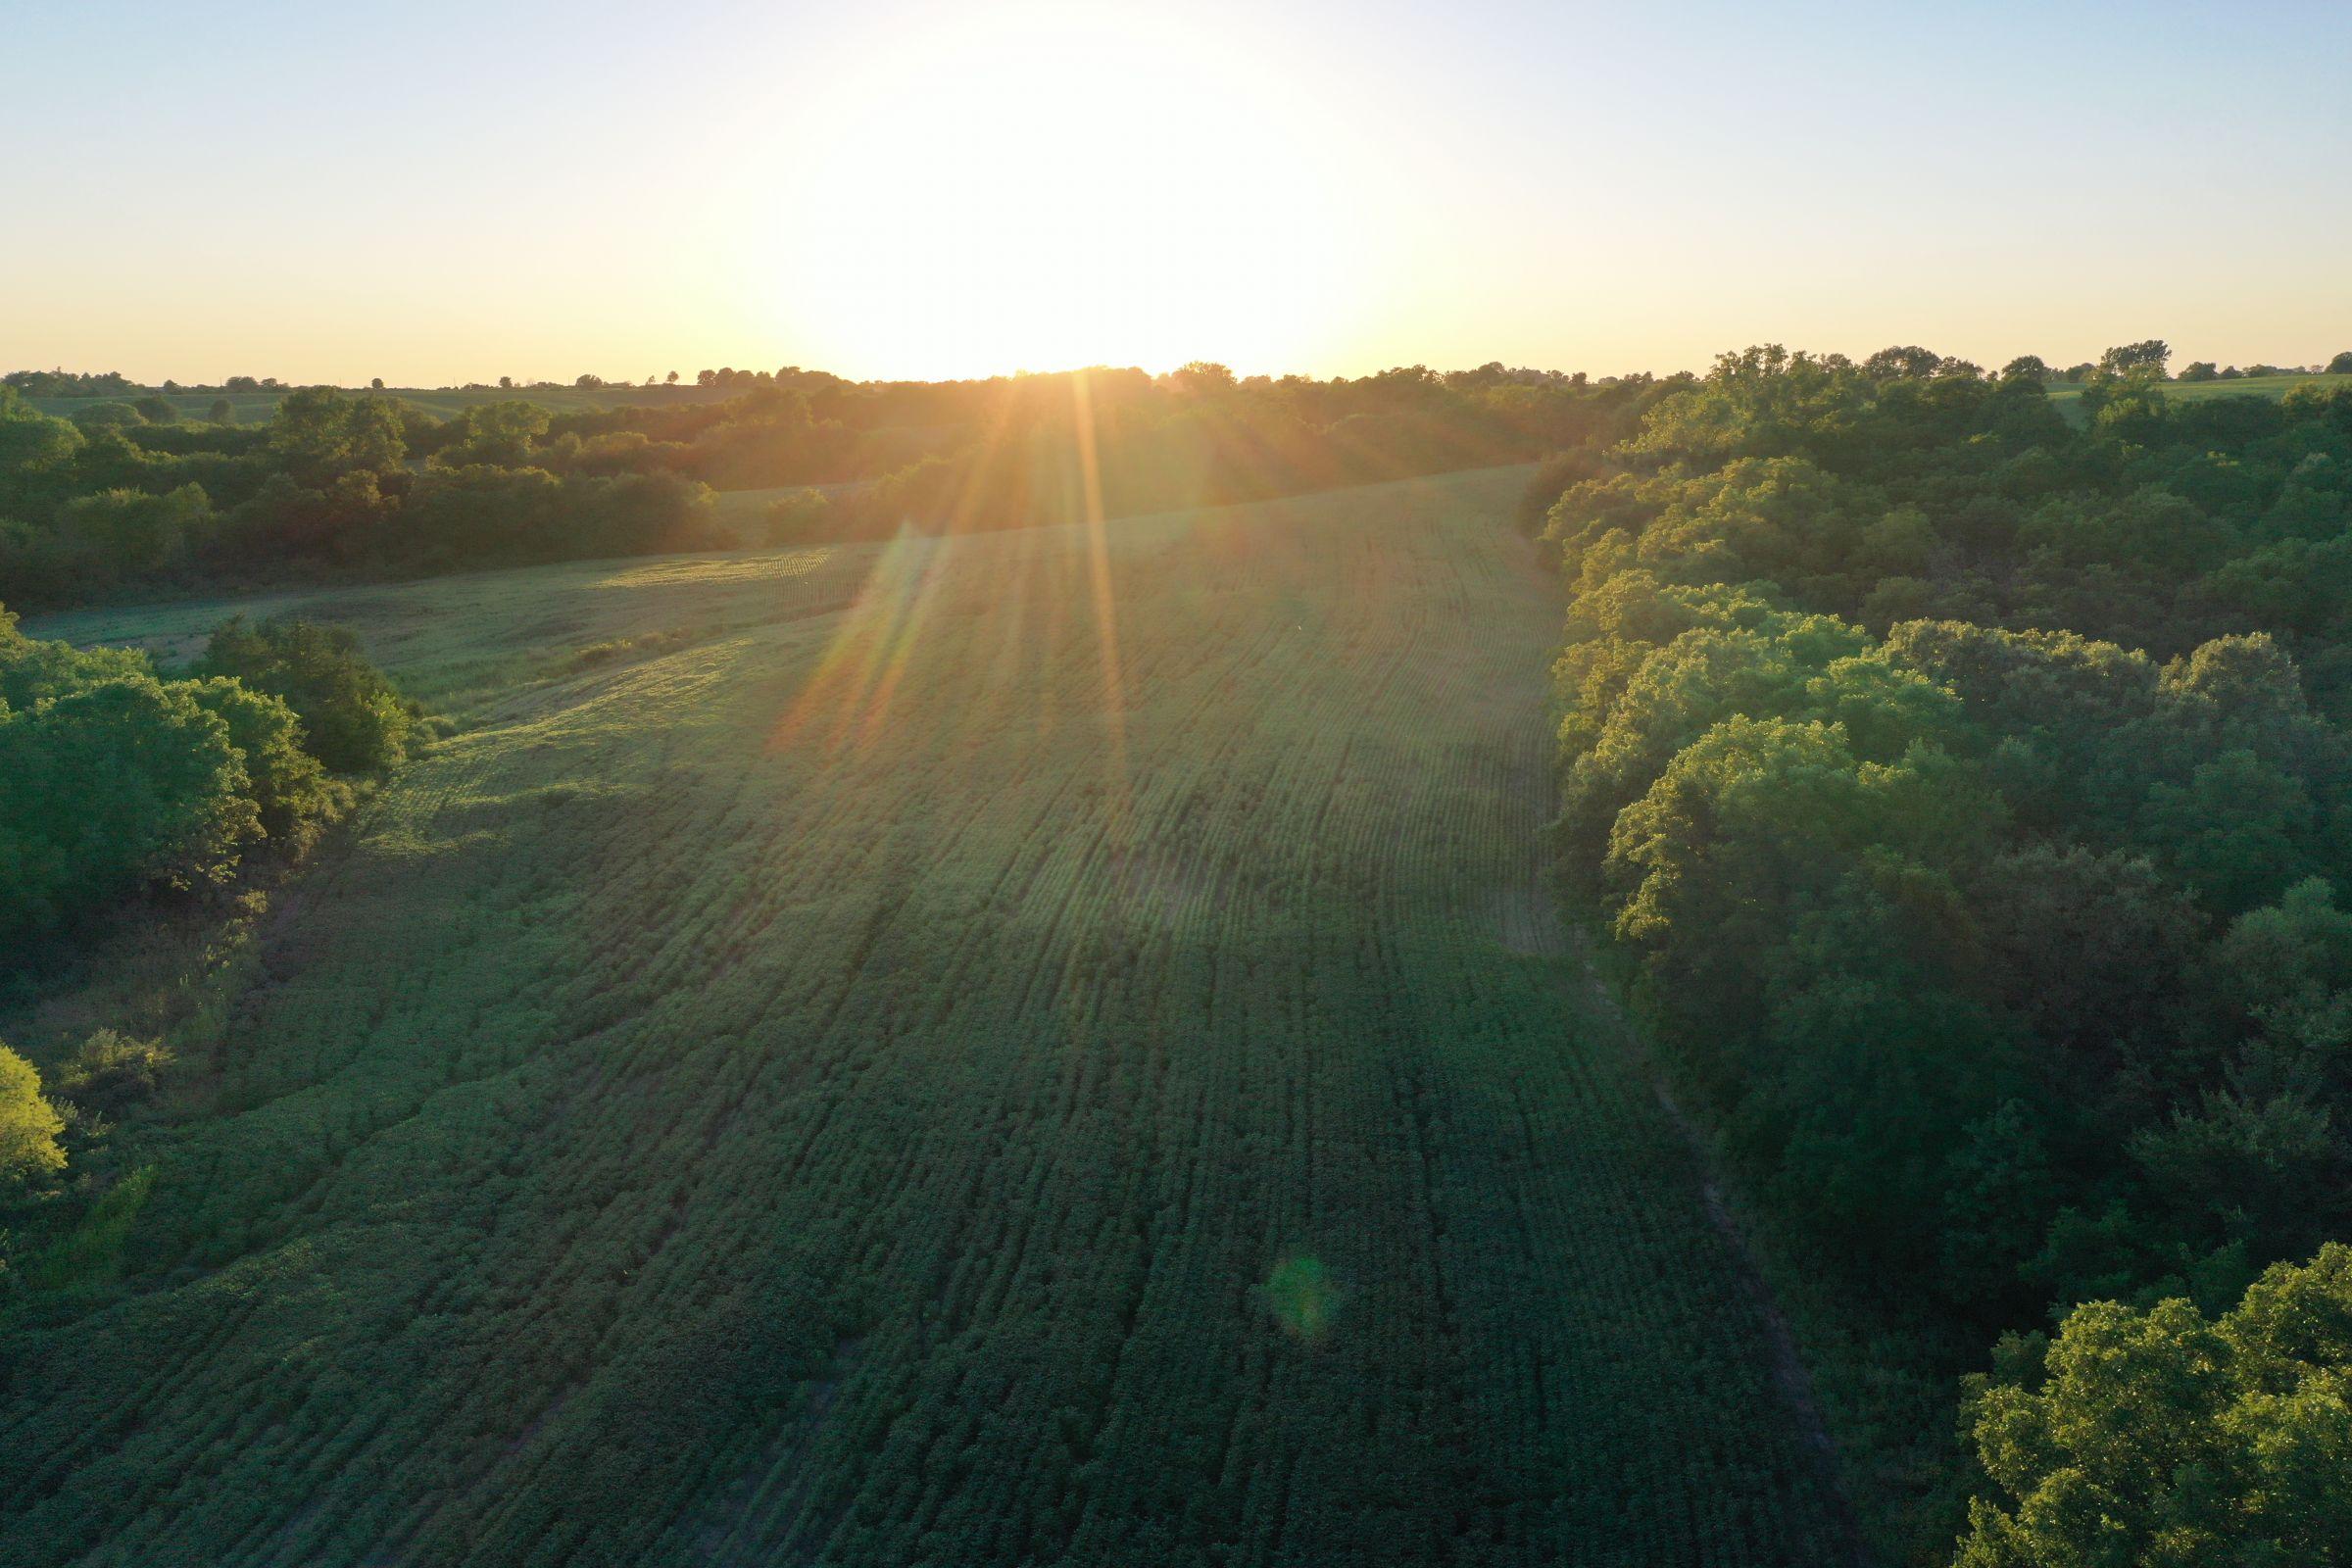 land-clarke-county-iowa-325-acres-listing-number-15416-9-2021-03-18-162805.JPG